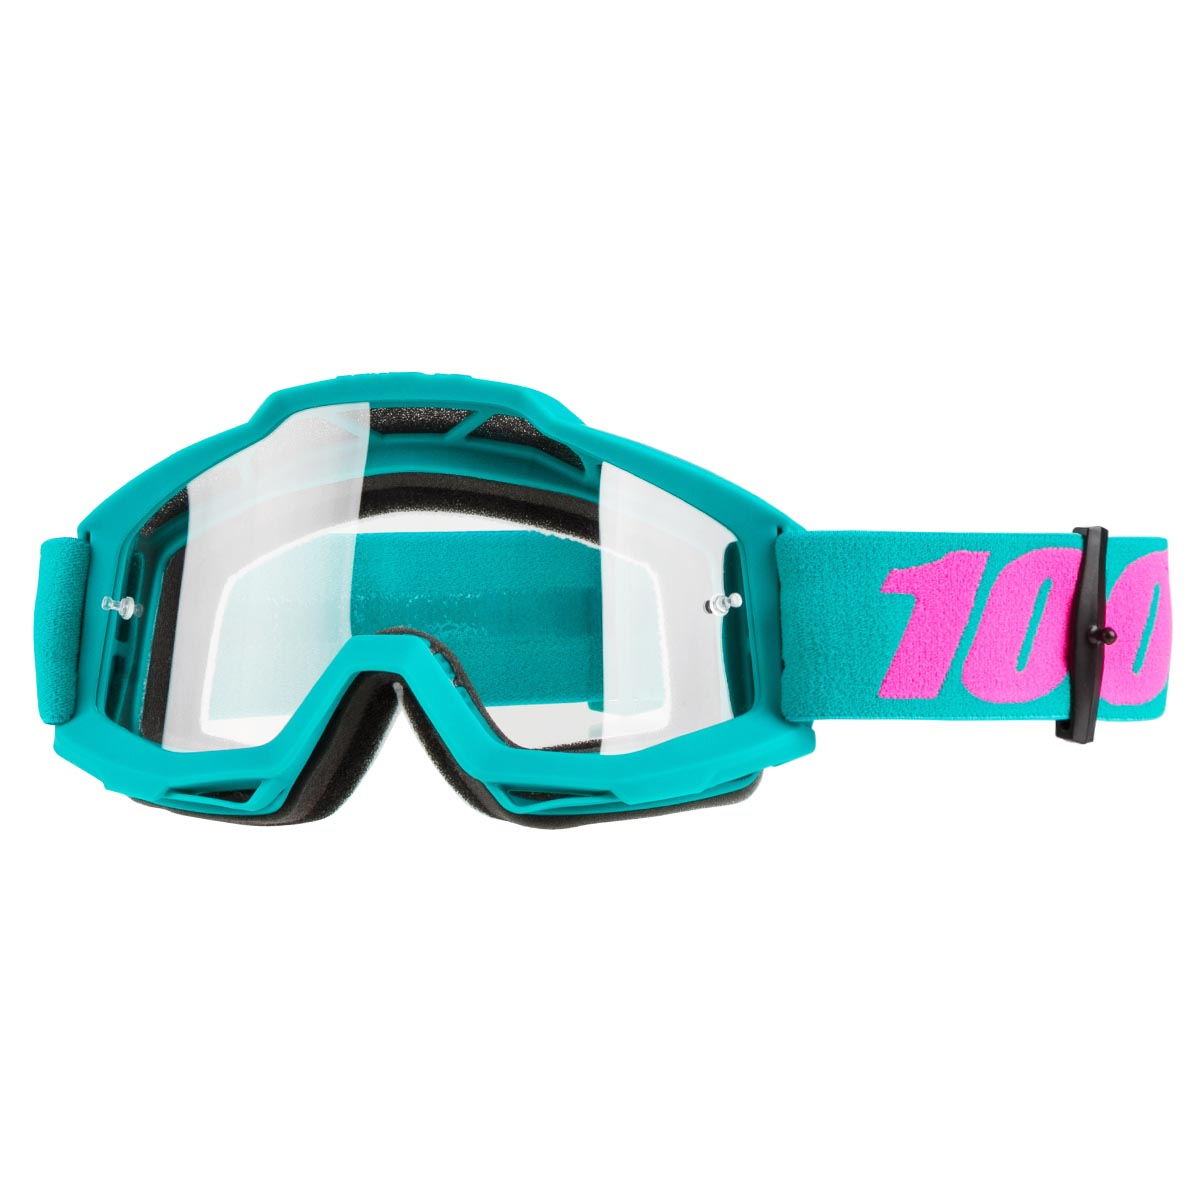 100% Crossbrille The Accuri Passion - Klar Anti-Fog